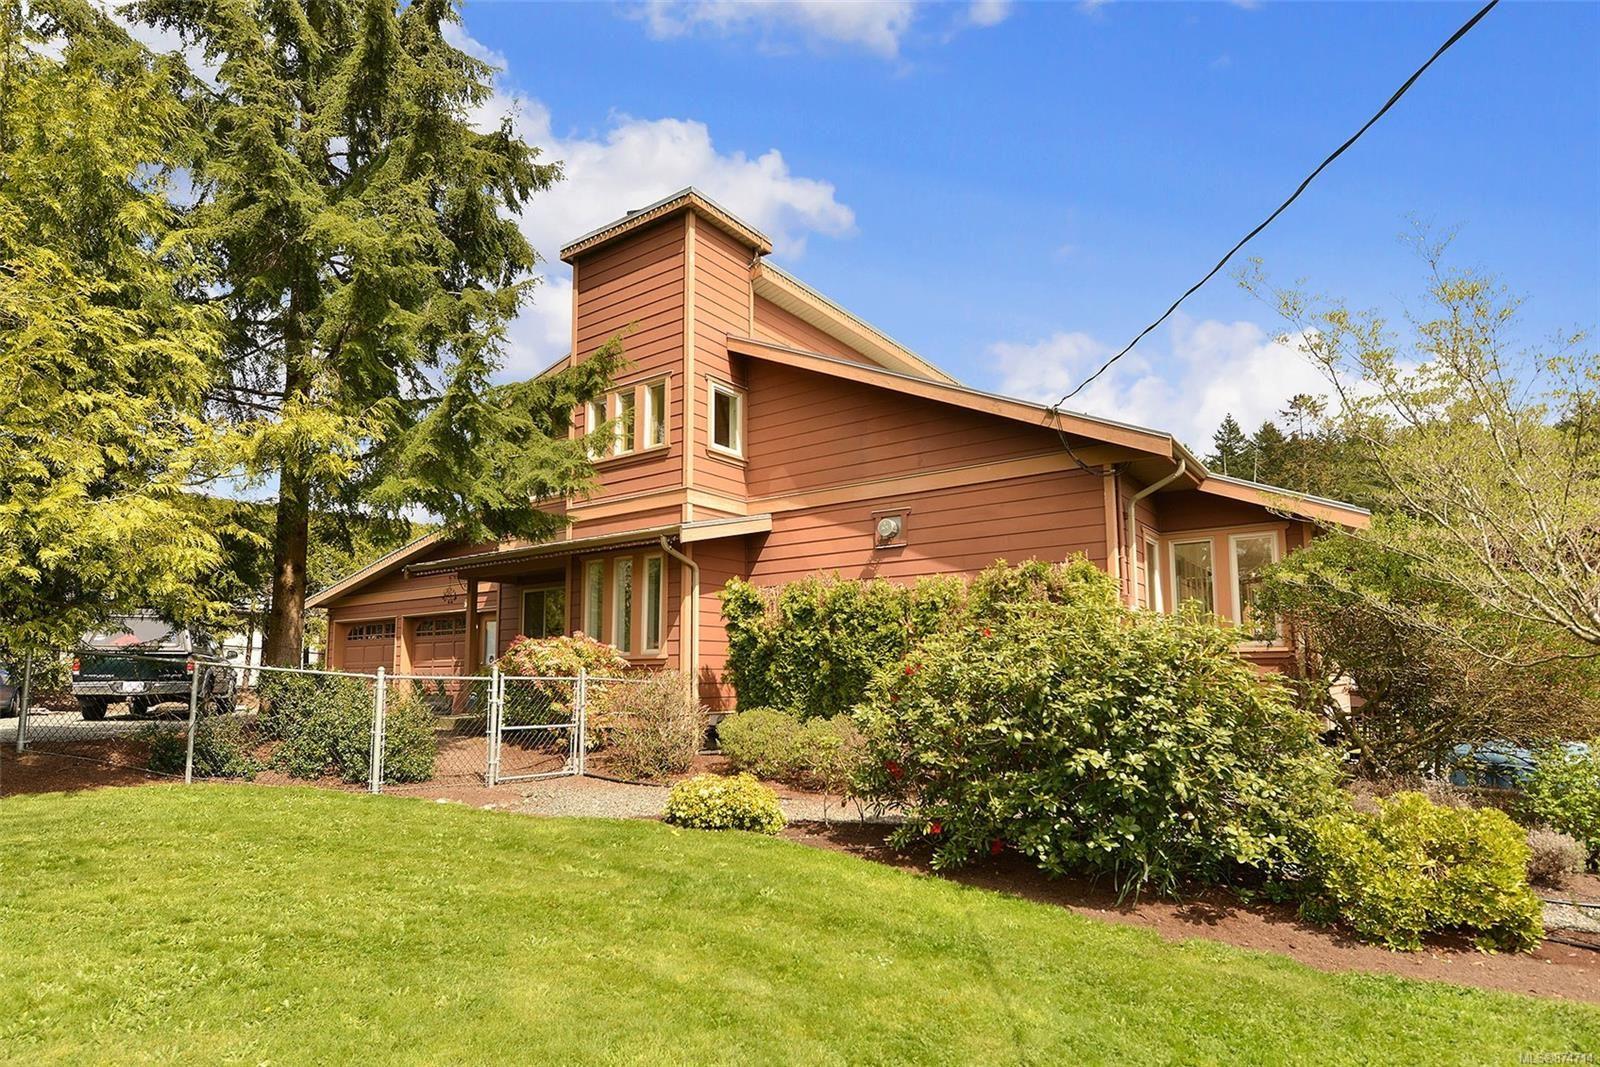 Main Photo: 5987 Oldfield Rd in : SW Elk Lake House for sale (Saanich West)  : MLS®# 874714